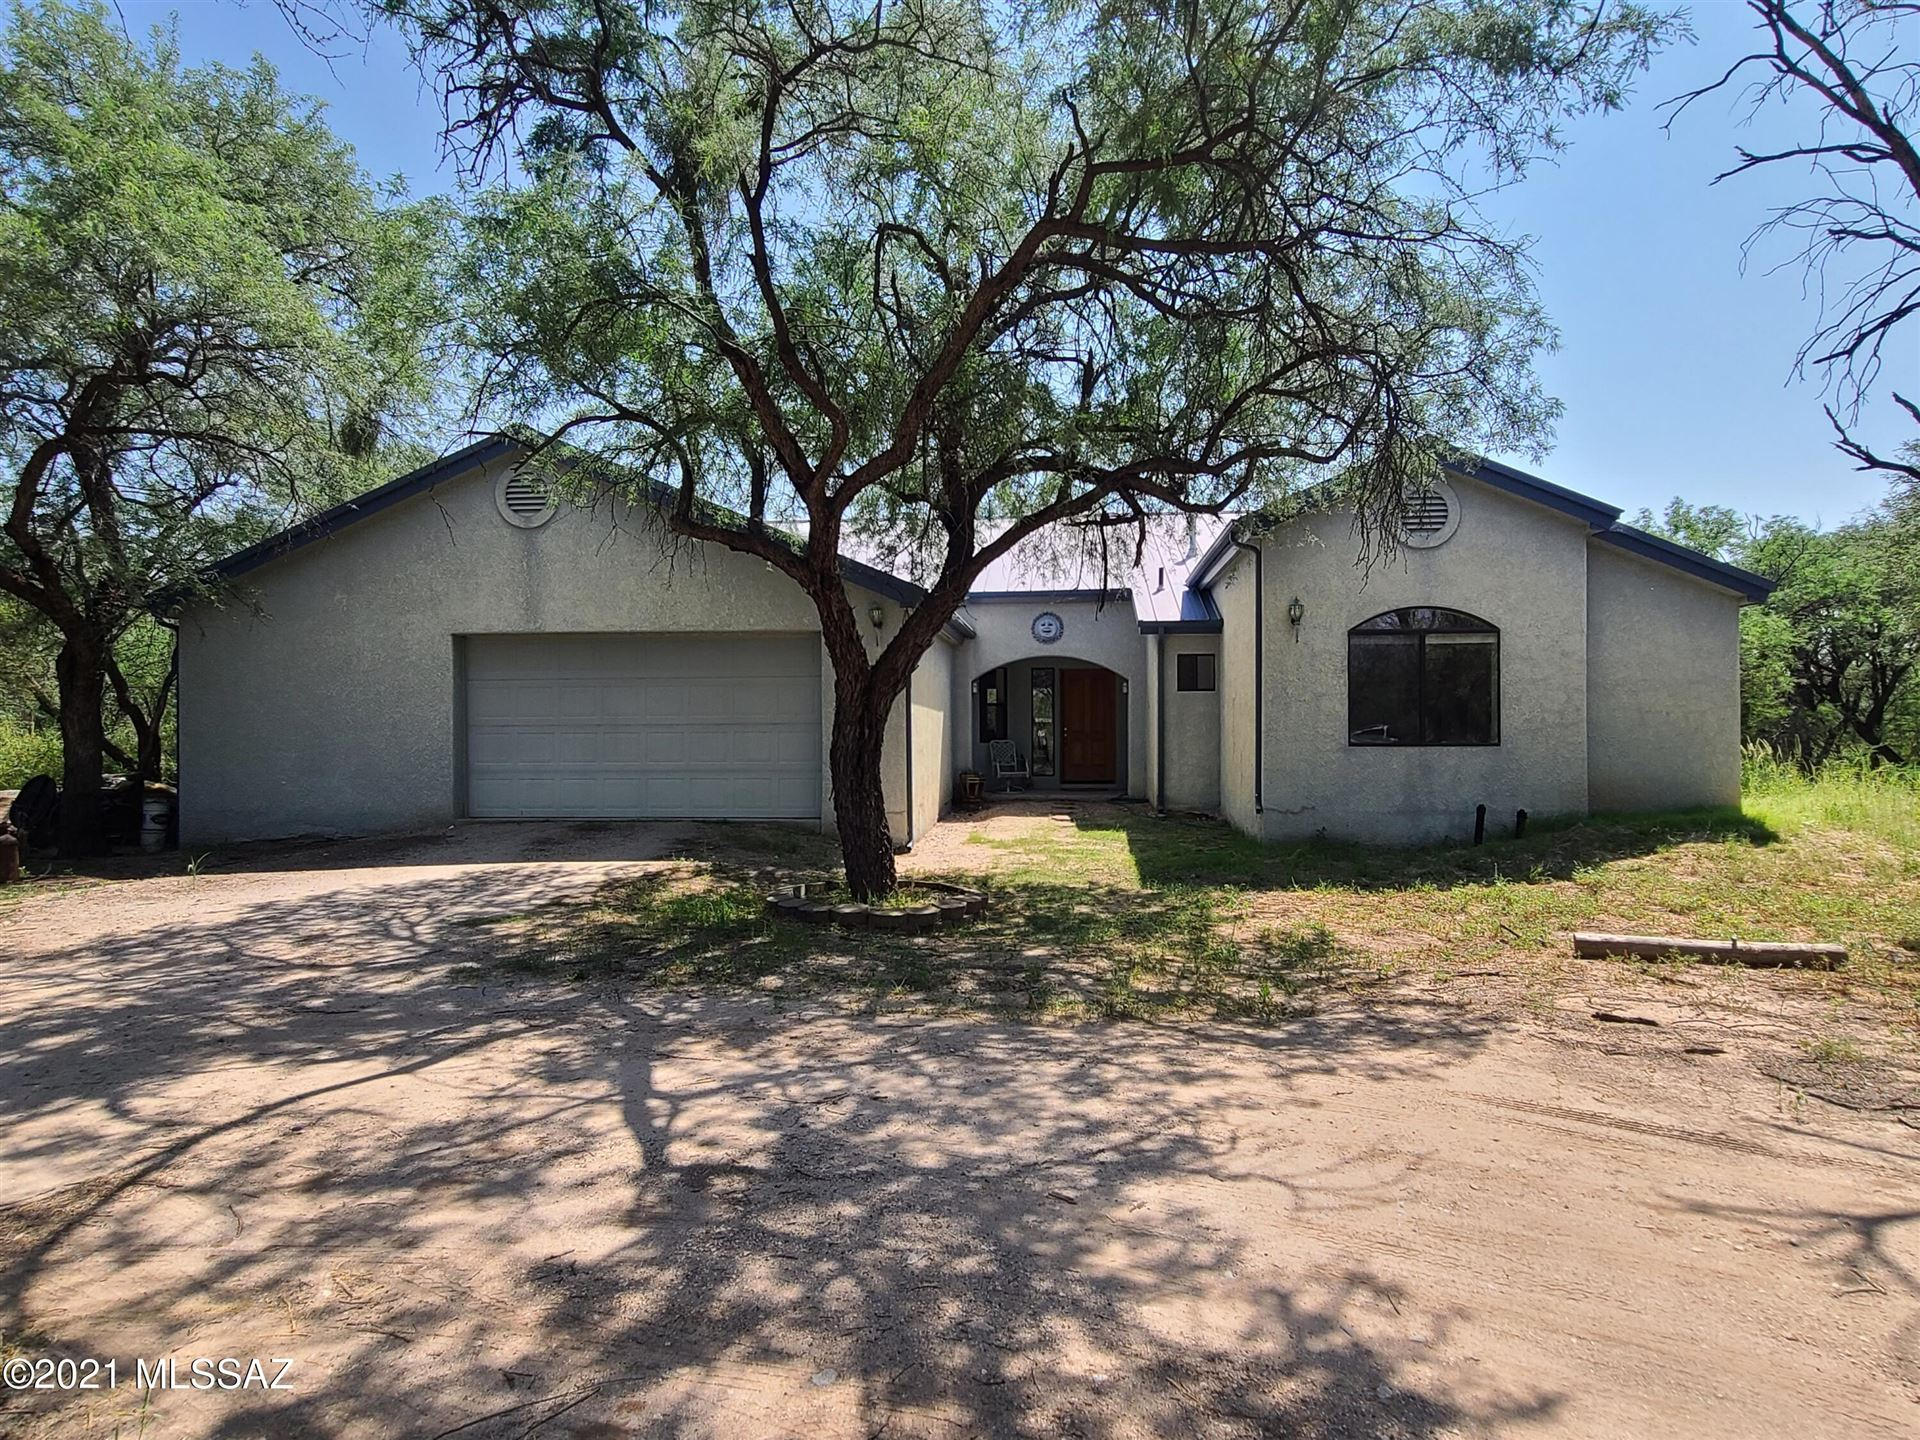 10858 E Tanque Verde Road, Tucson, AZ 85749 - MLS#: 22123966